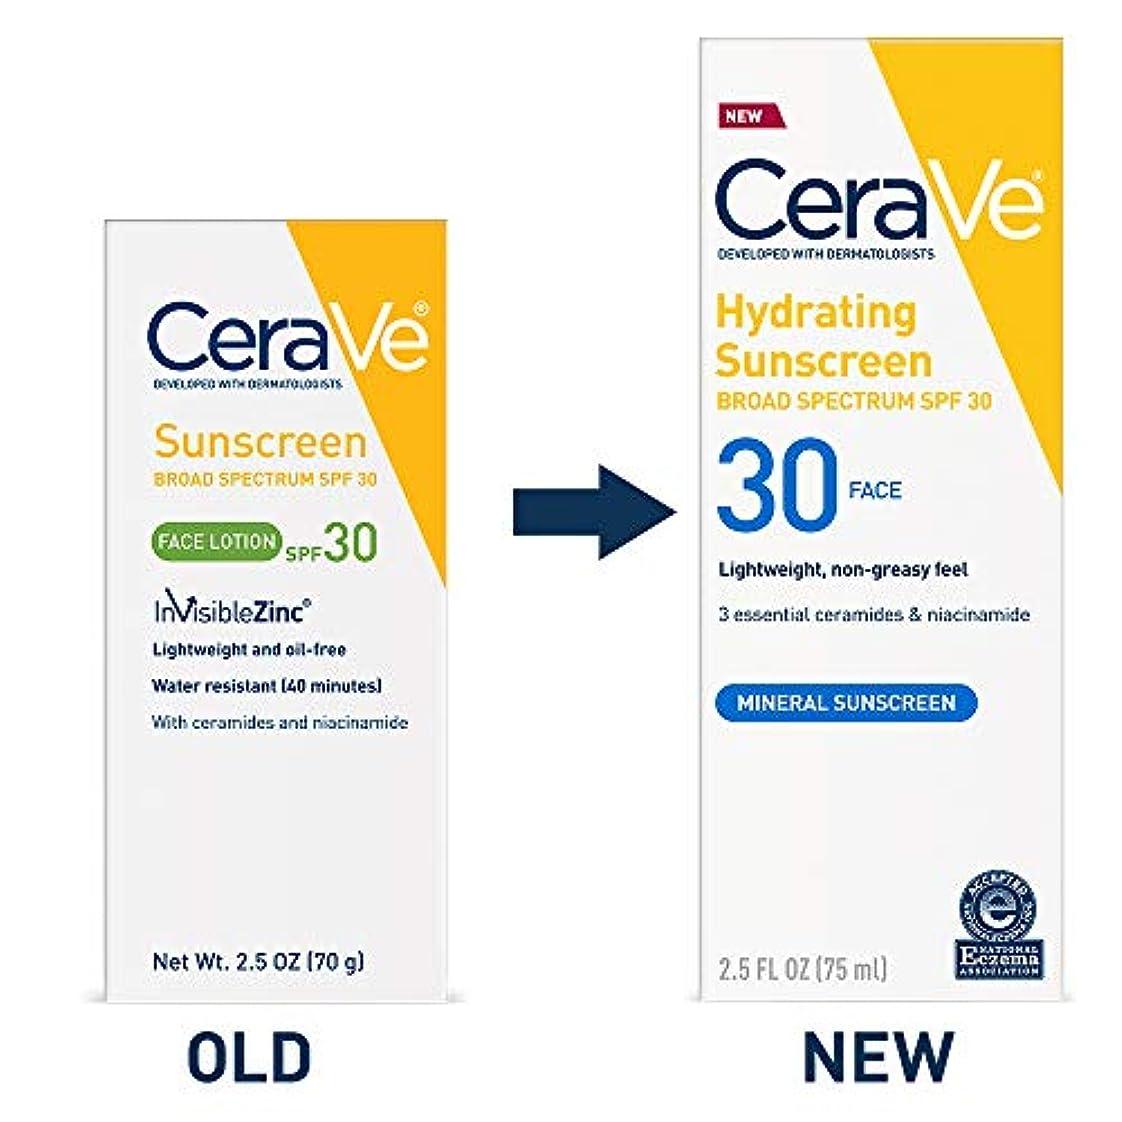 CeraVe 日焼け止めフェイスローションSPF 30 2.5オンス酸化亜鉛、広域スペクトル日保護のためのナイアシンアミドとセラミド